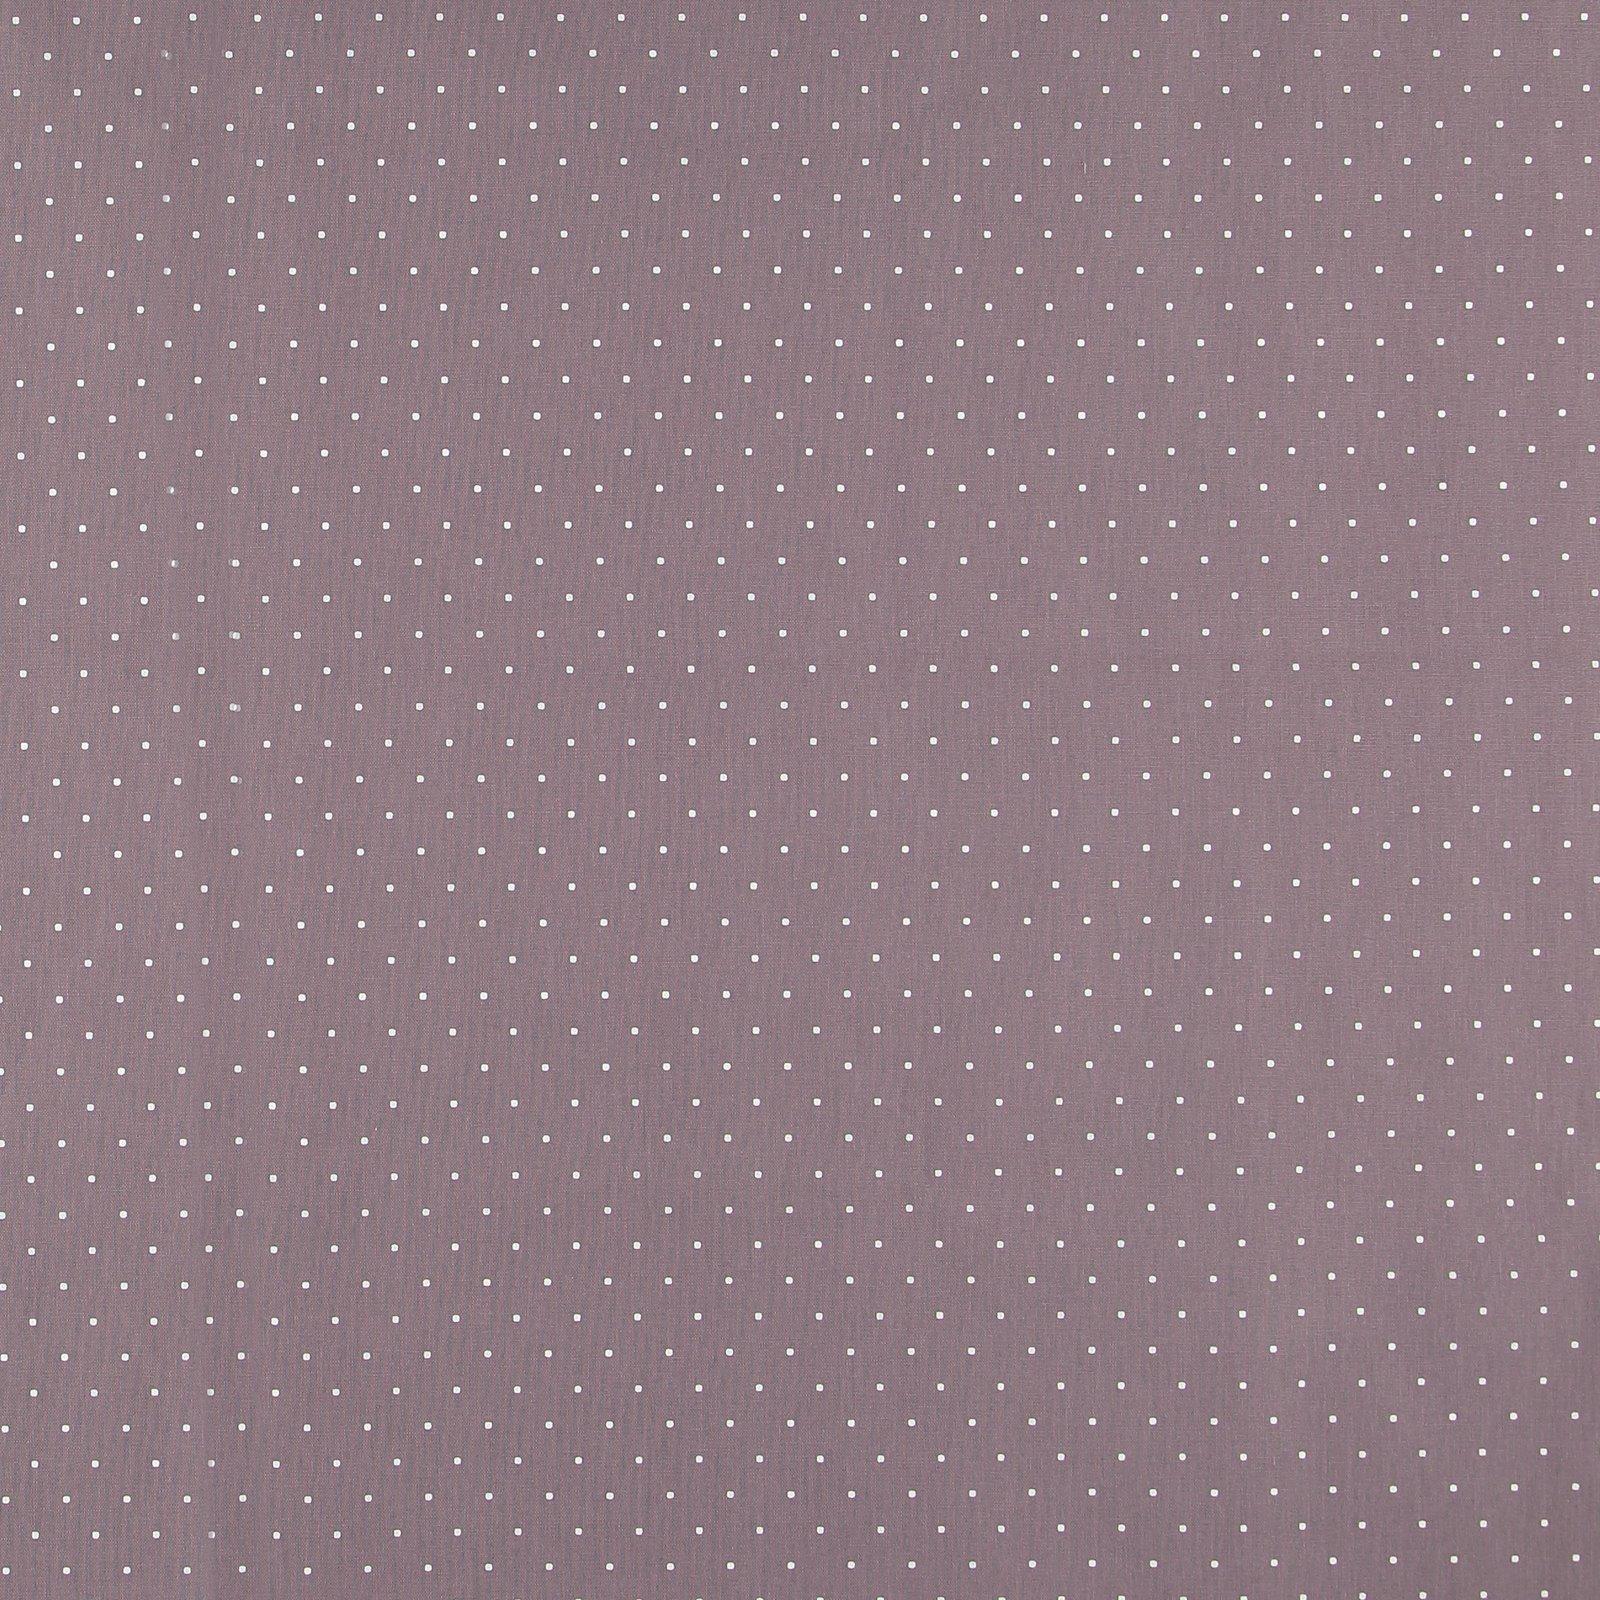 Half panama light dusty heather w dots 816217_pack_sp